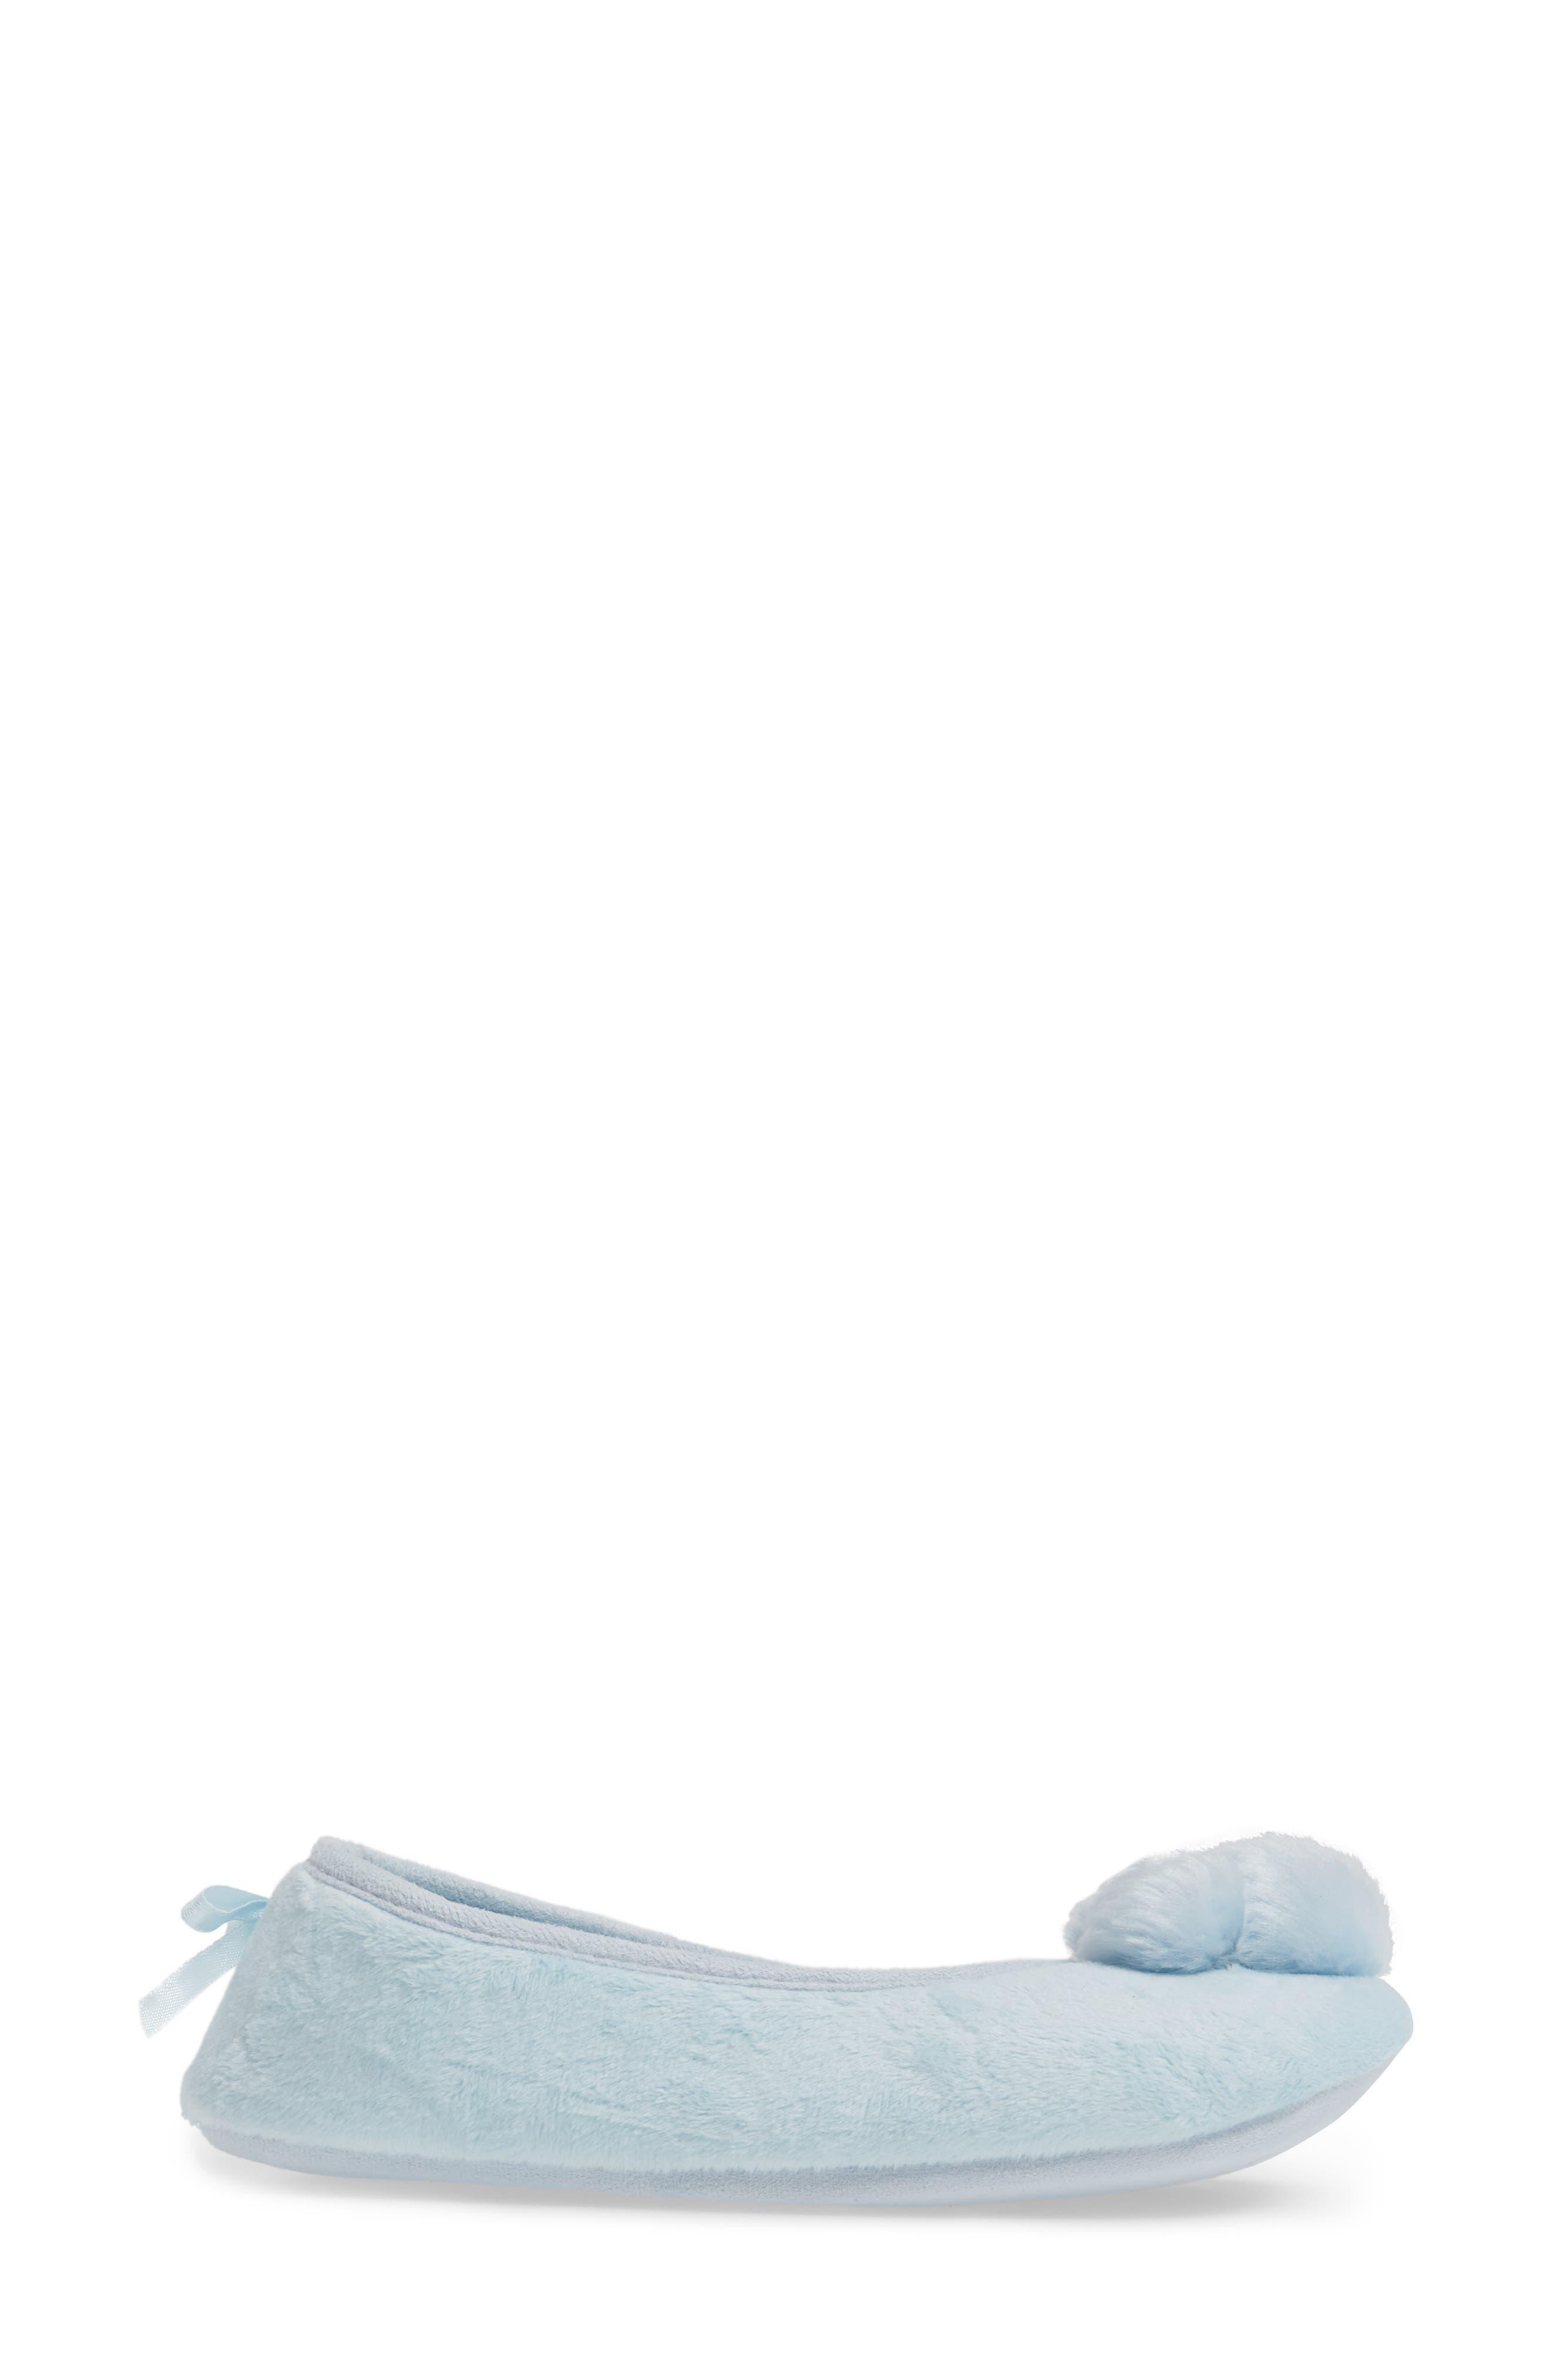 Plush Pompom Slipper,                             Alternate thumbnail 3, color,                             Blue